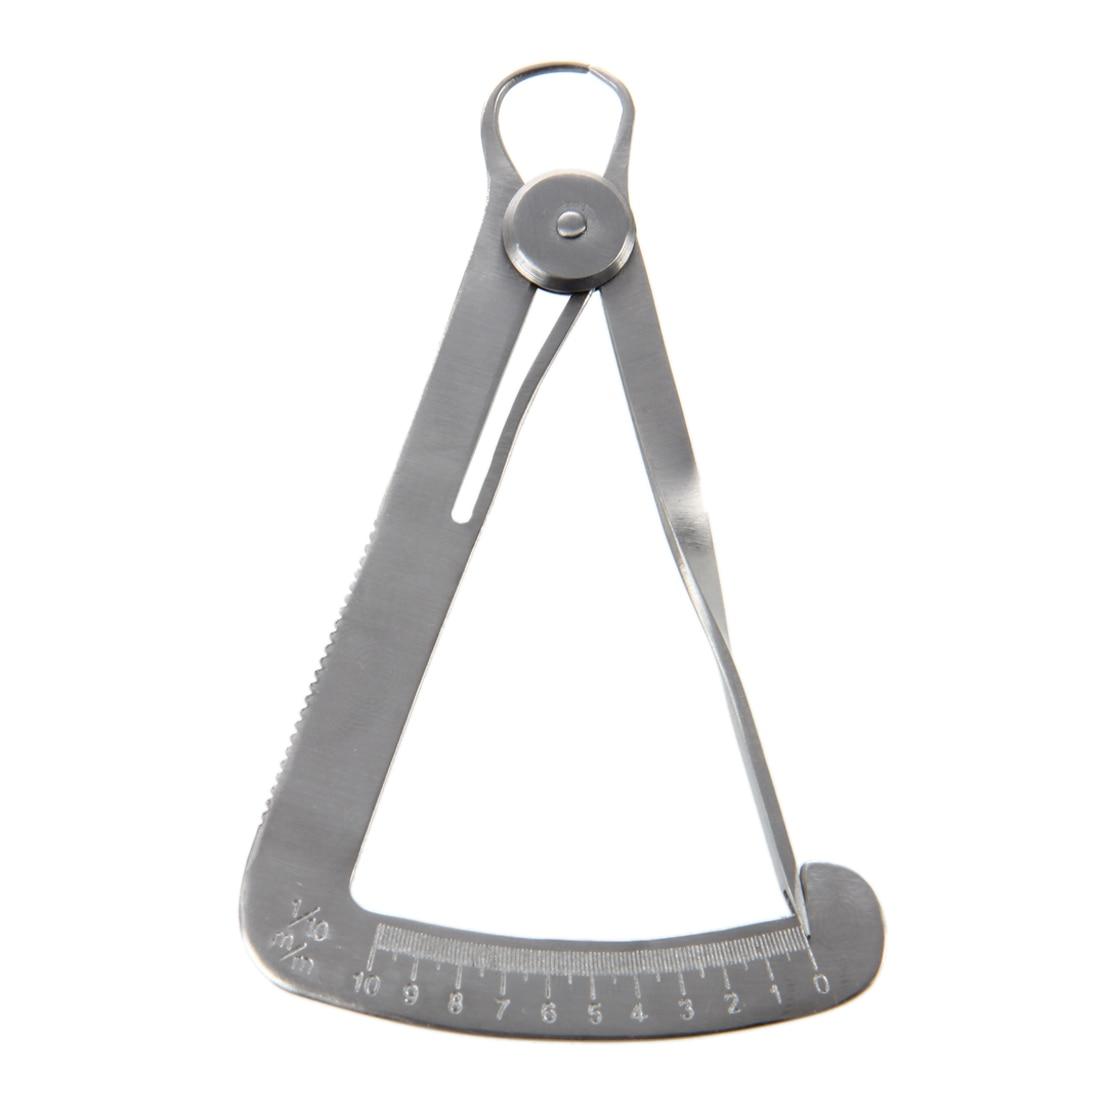 Jeweller Stone Diamond Gauge Measuring Caliper Metal Tool